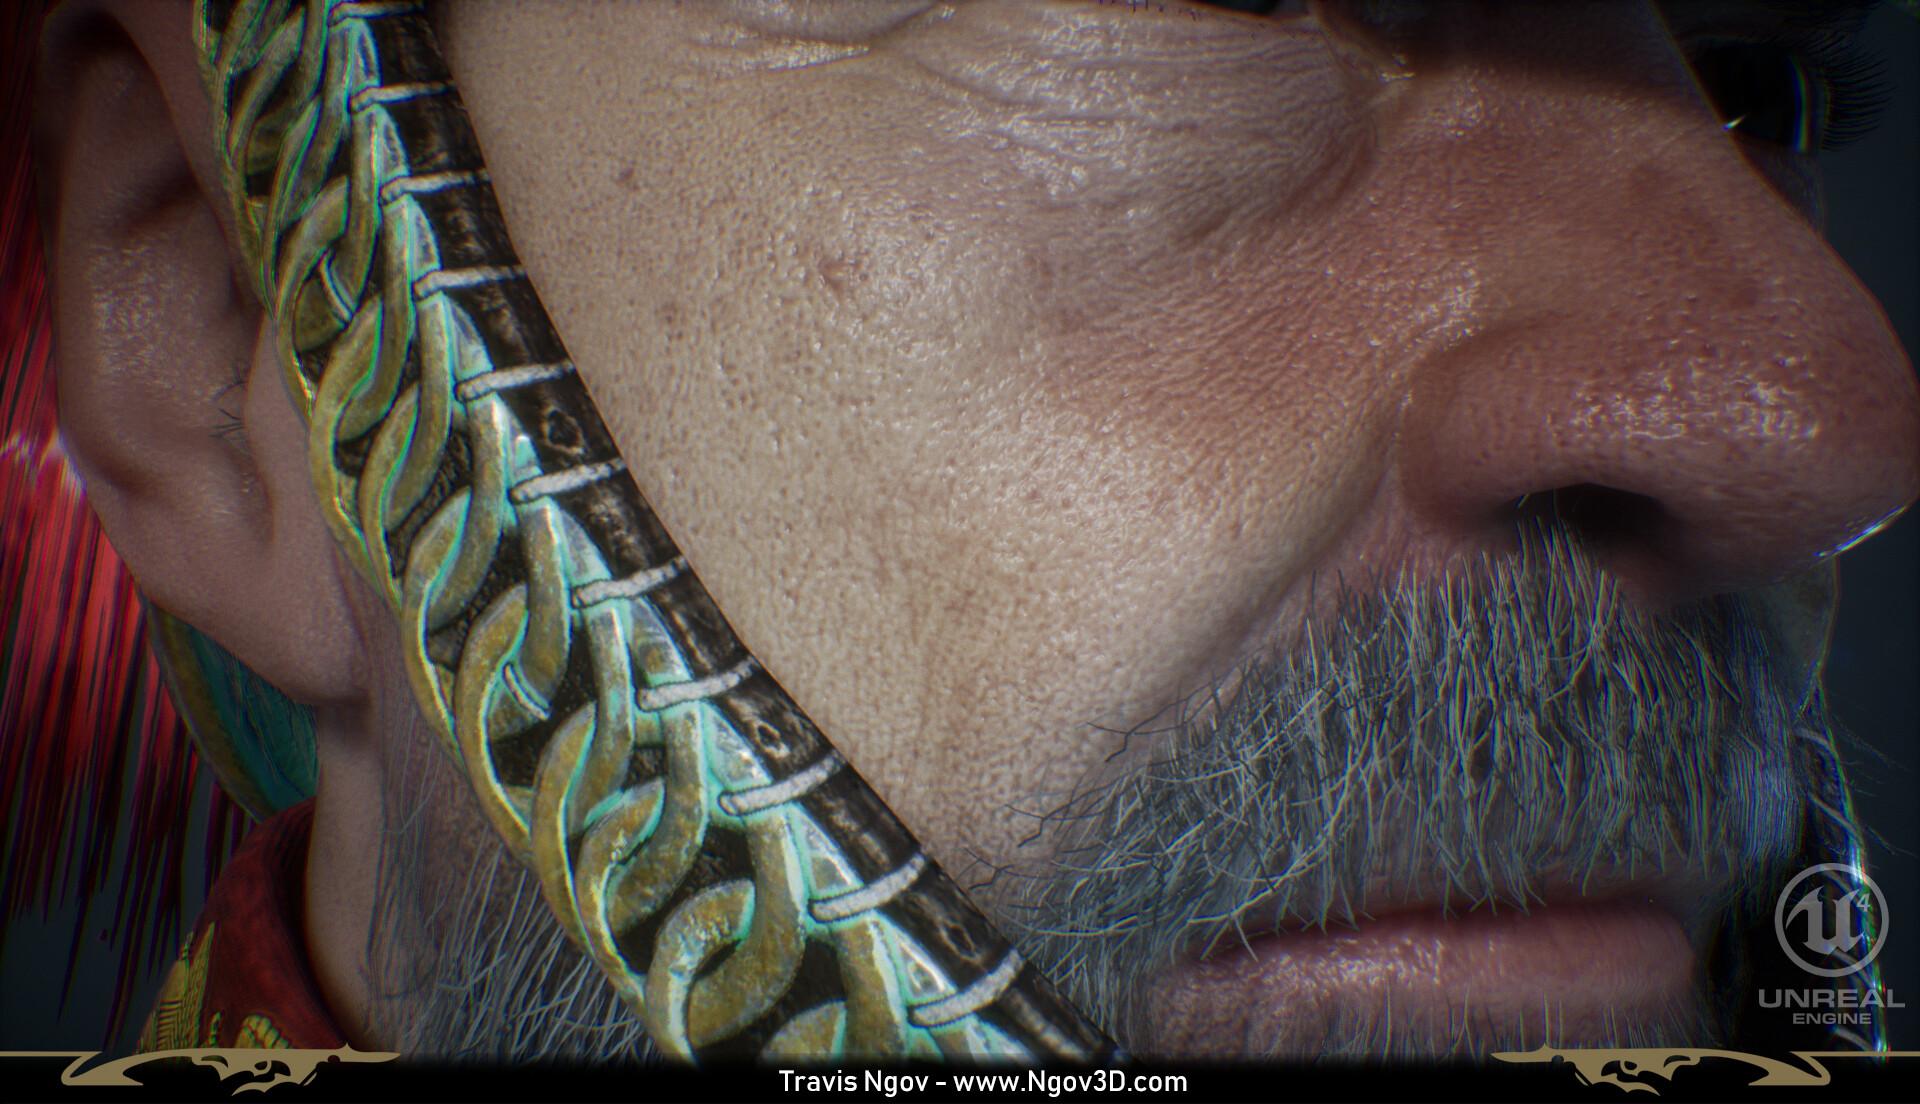 Travis ngov bust gameres closeup 03